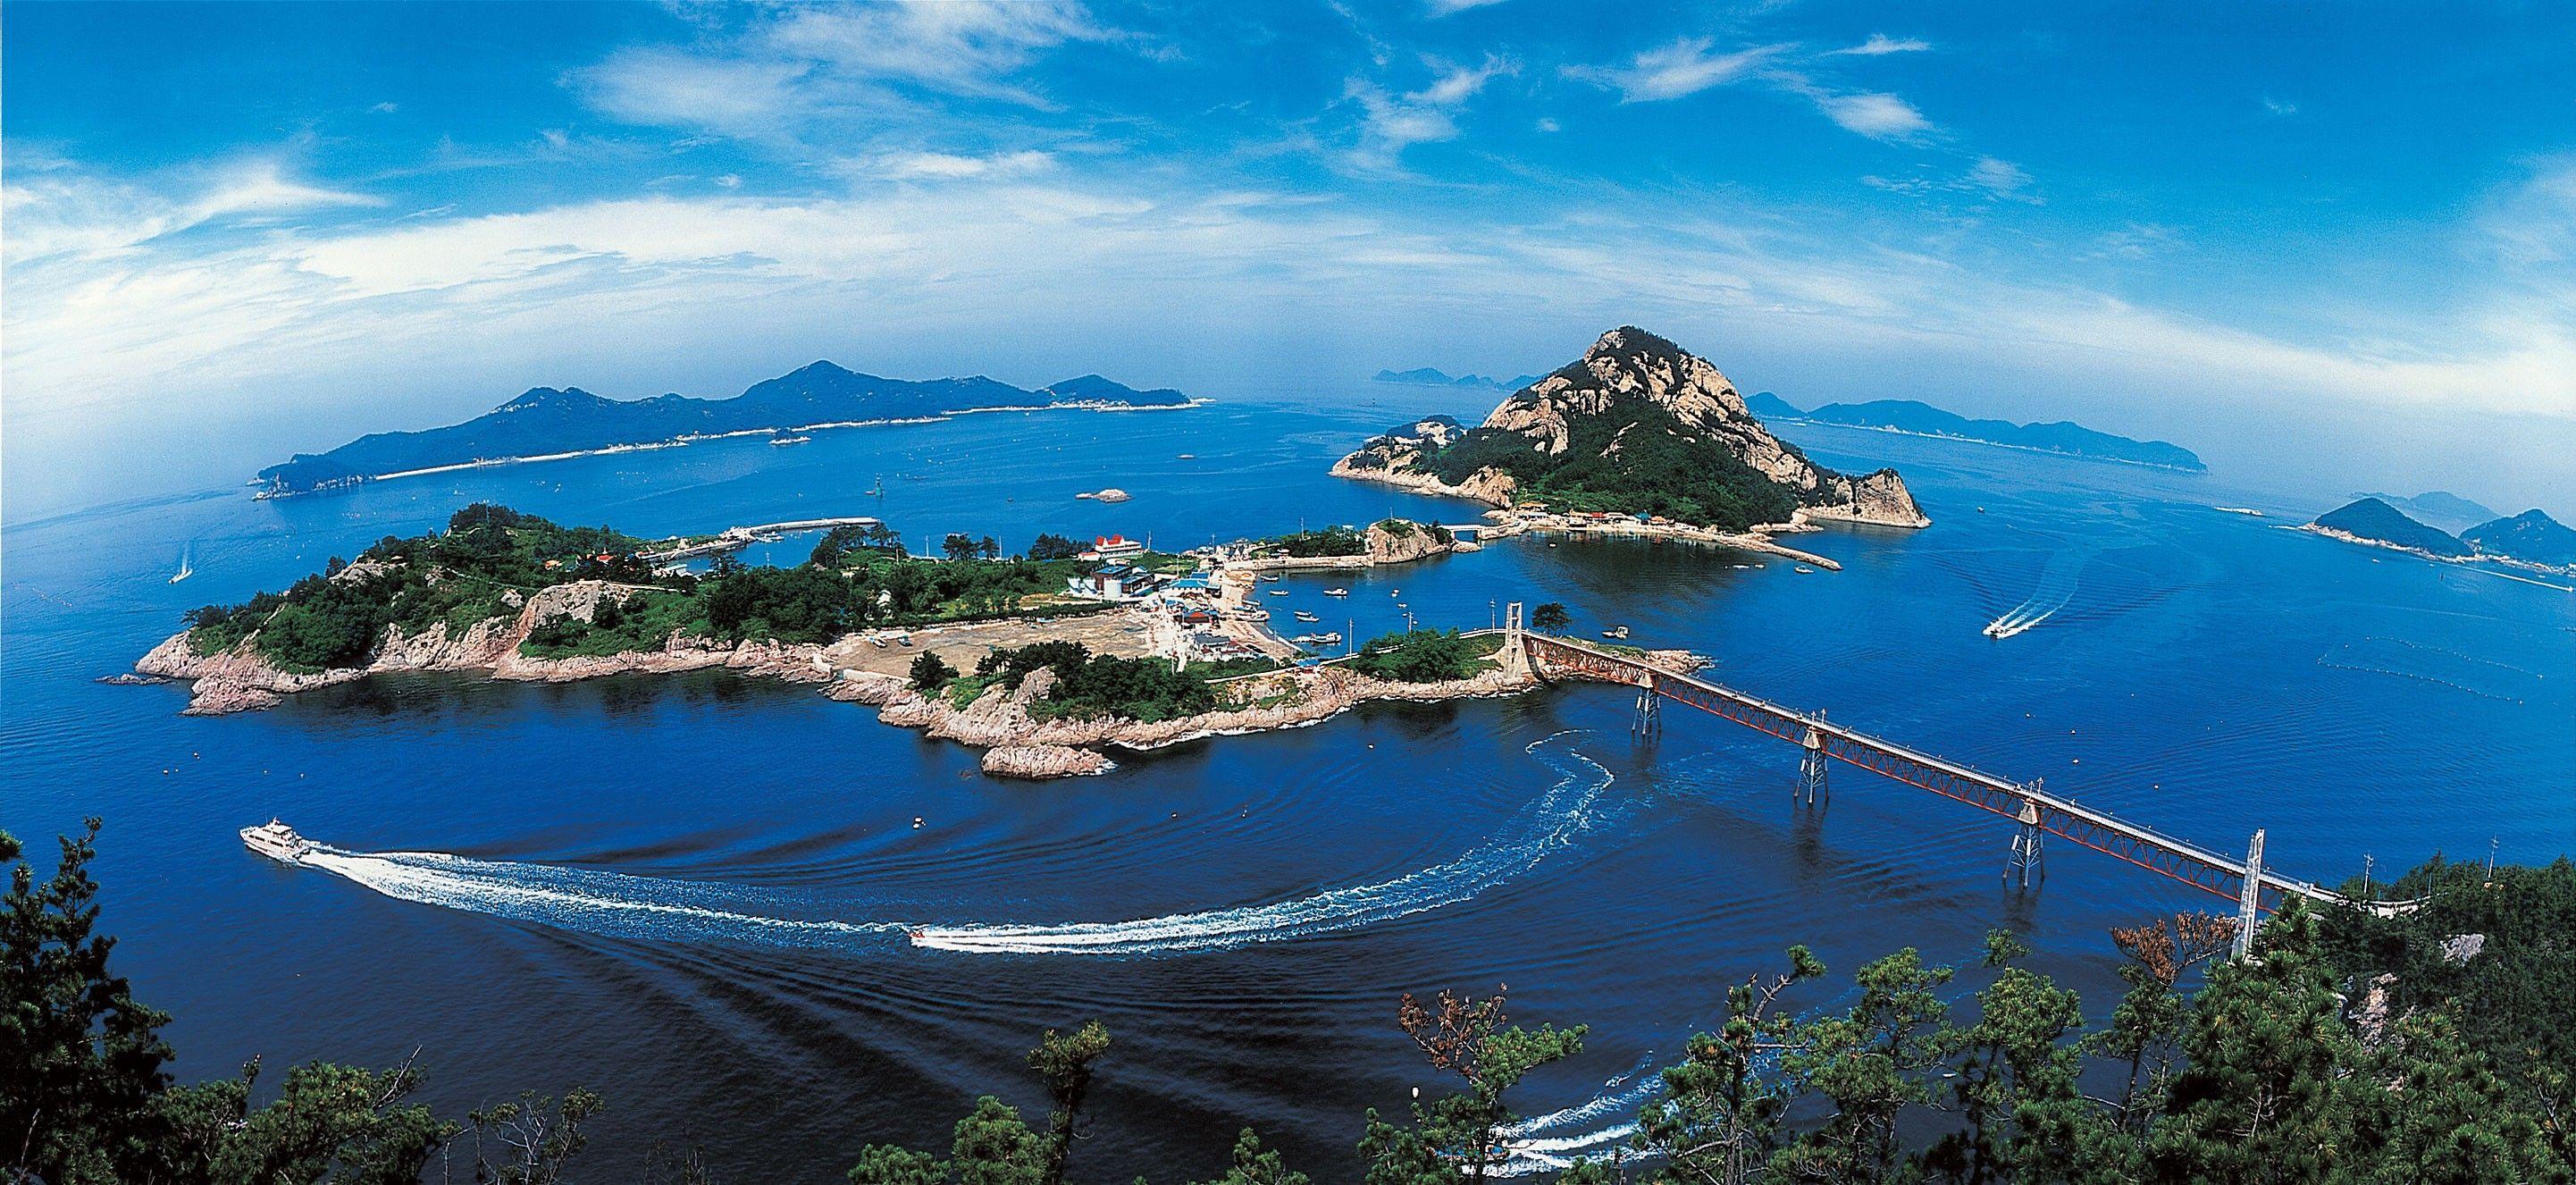 Korean Islands Wallpapers Top Free Korean Islands Backgrounds Wallpaperaccess